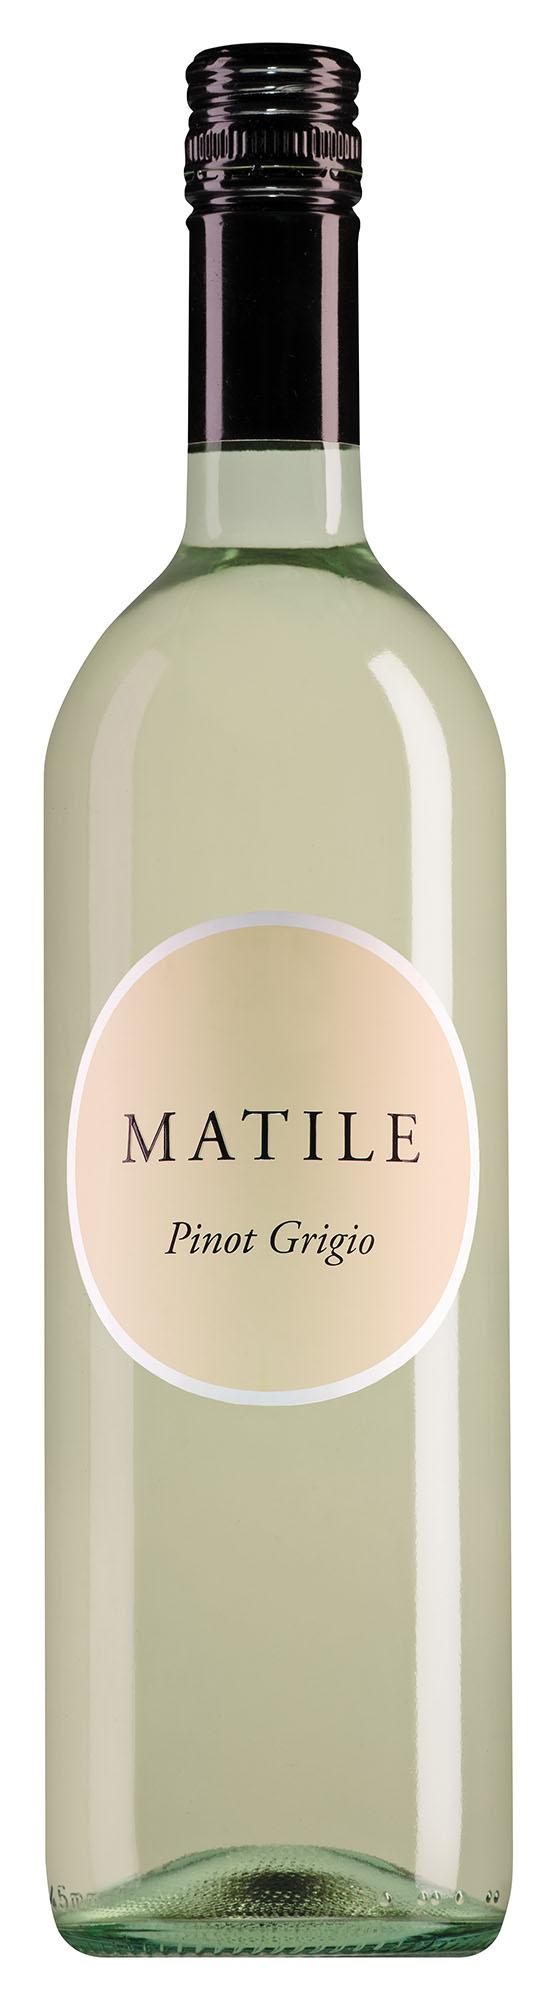 Cantina Cardèto Umbria Matile Pinot Grigio